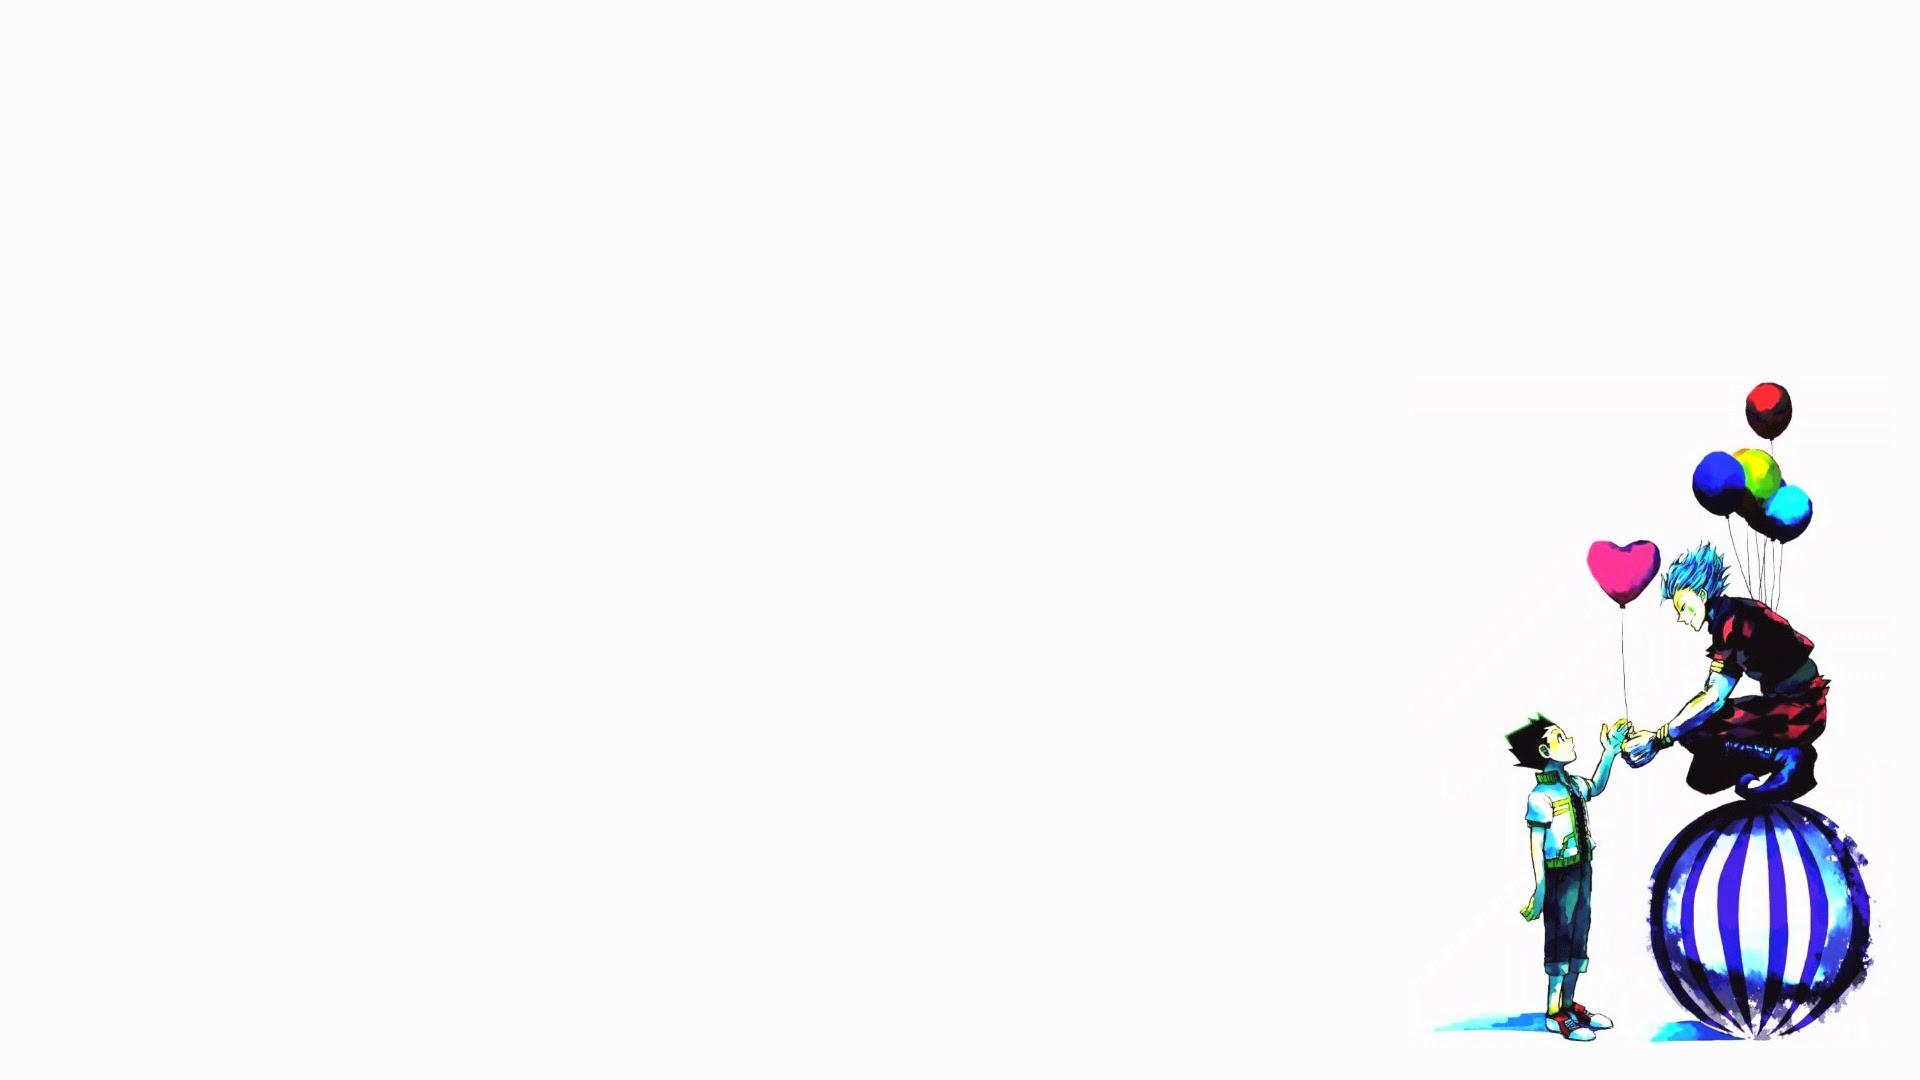 Gon Hisoka Hunter X 2011 Anime Hd Wallpaper 1920x1080 1q